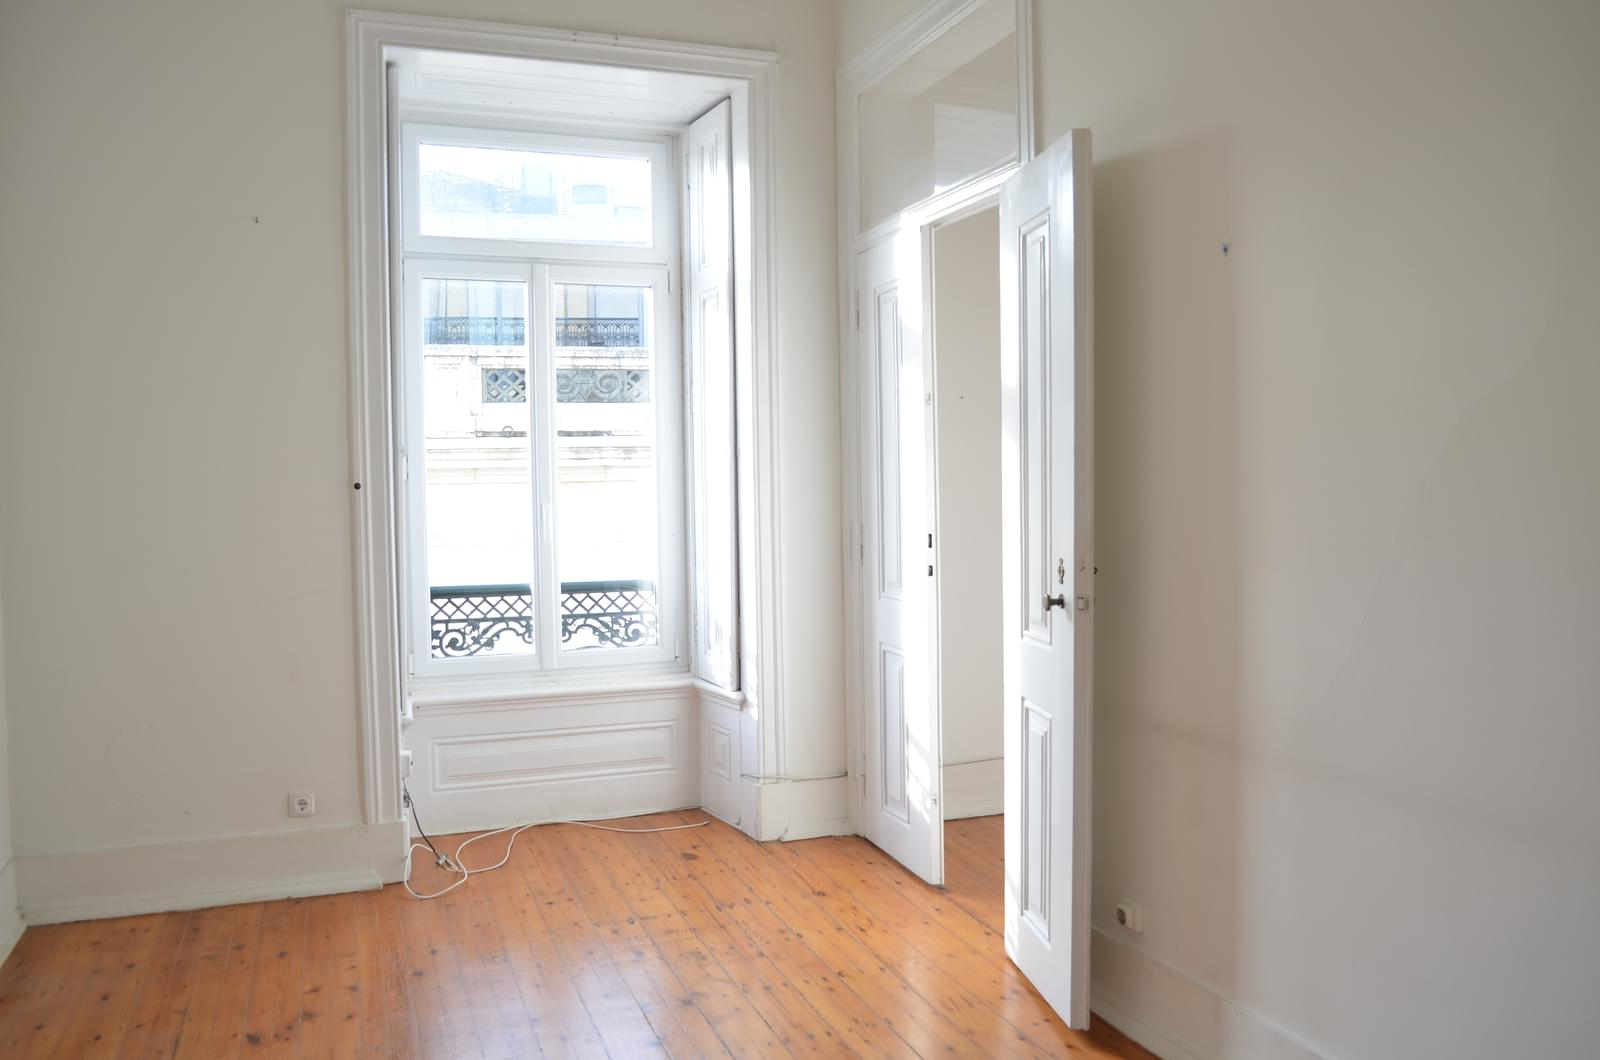 pf18621-apartamento-t4-lisboa-9cbf1ccf-7d3e-43f1-a57d-5ad7d24d4d47